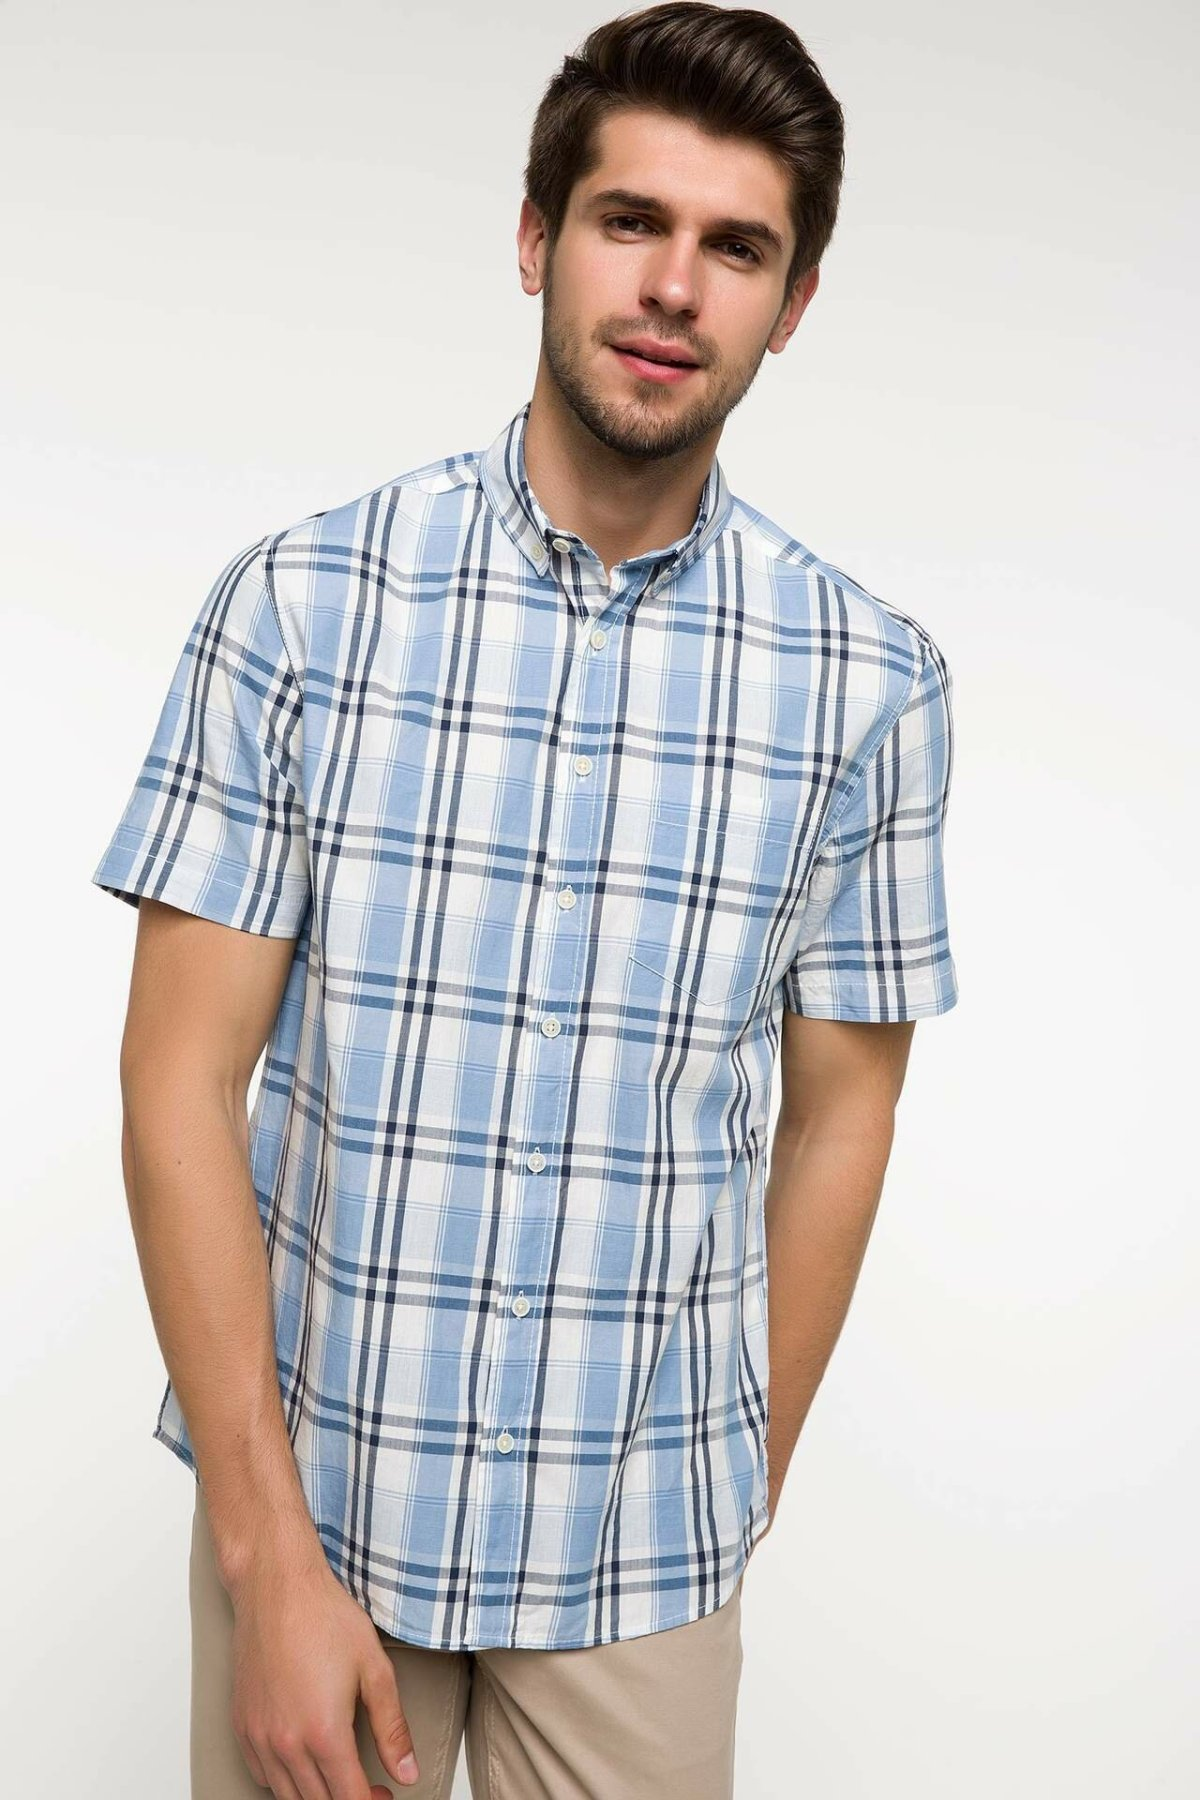 DeFacto Man Summer Plaids Short Sleeve Shirt Men Smart Casual White Grids Top Shirts-I7874AZ18SM